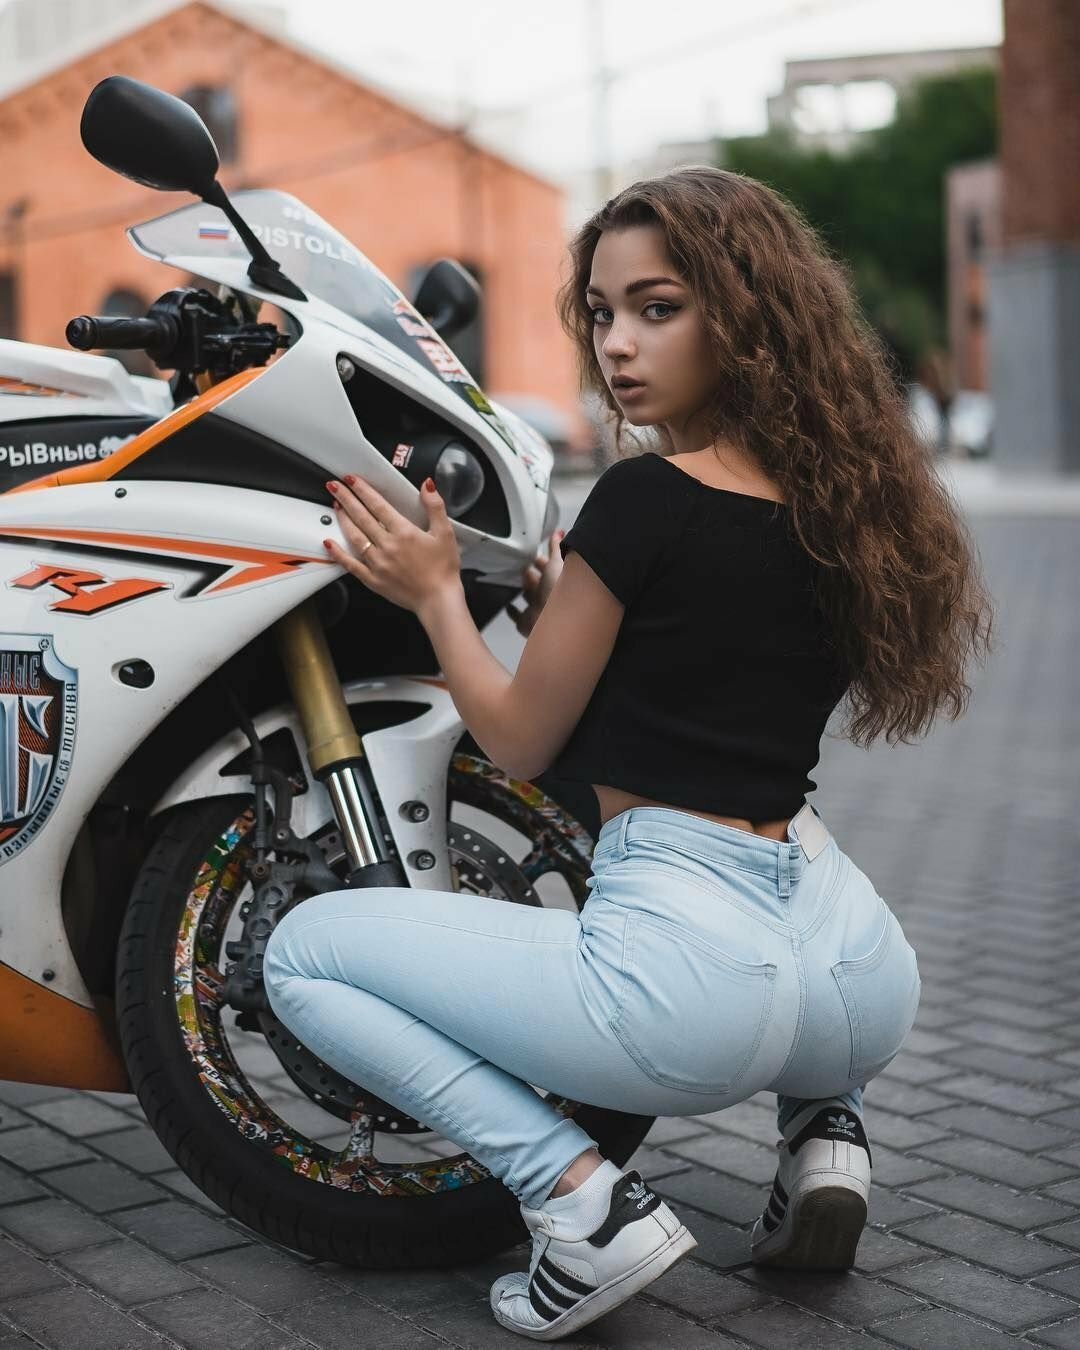 Мотоциклы с девушками картинки